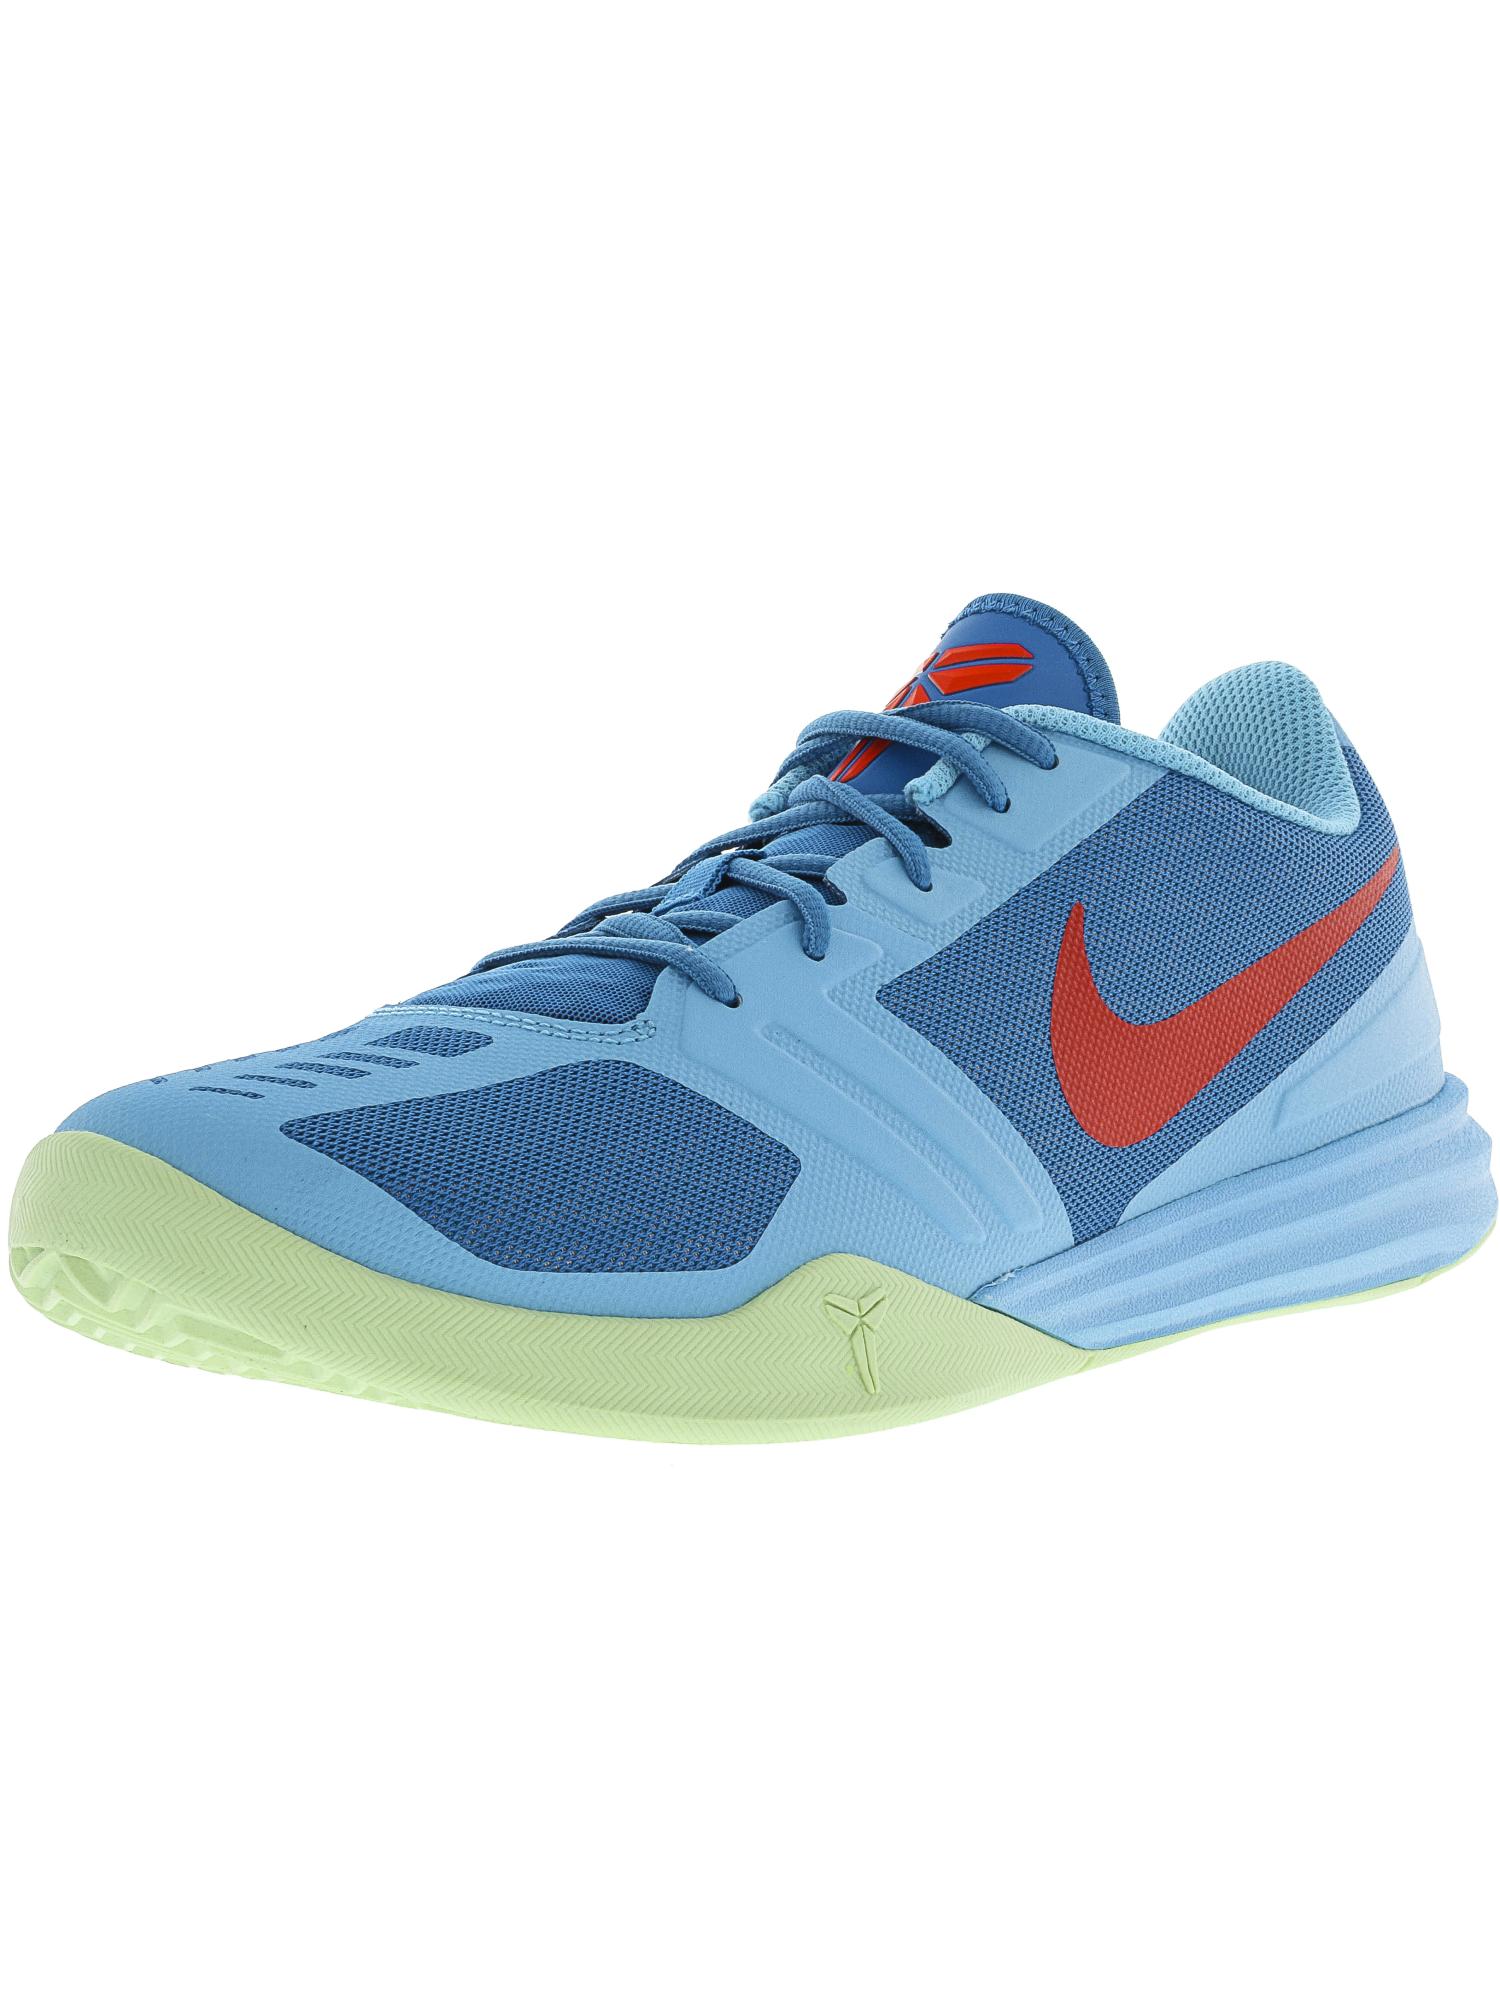 buy online 551f0 52b71 Nike Kobe Mentality Men US 11 Blue Basketball Shoe UK 10 EU 45   eBay